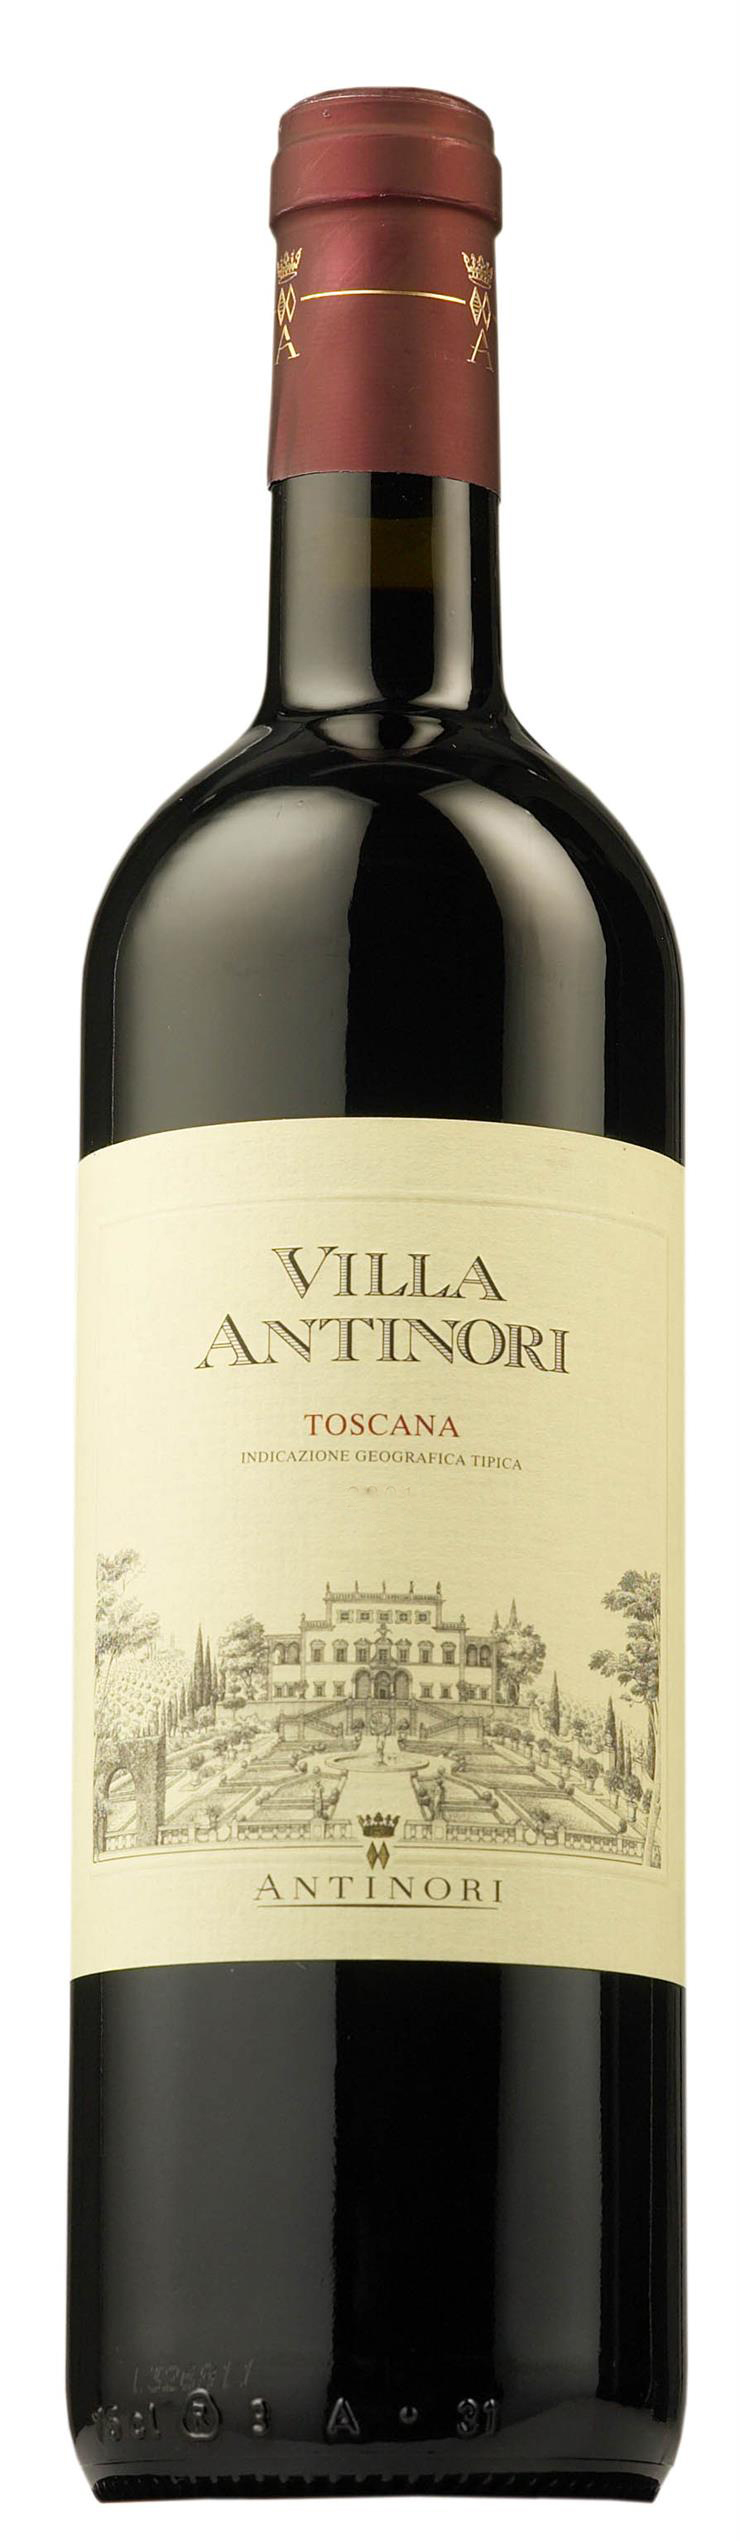 Antinori Villa Antinori Rosso 2013